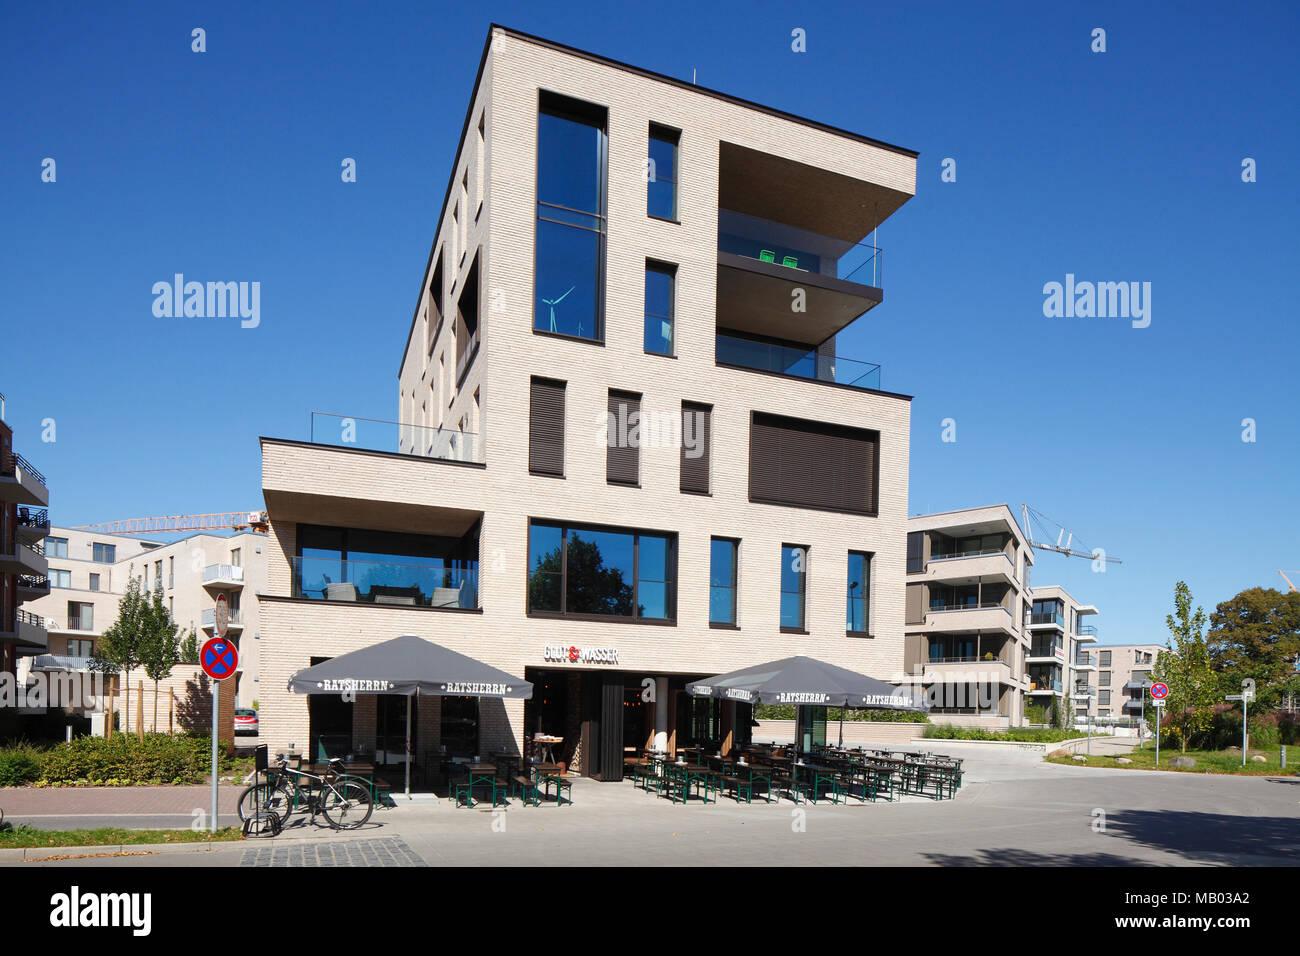 Amüsant Moderne Mehrfamilienhäuser Sammlung Von Modern Apartment Buildings, Oldenburg In Oldenburg, Lower